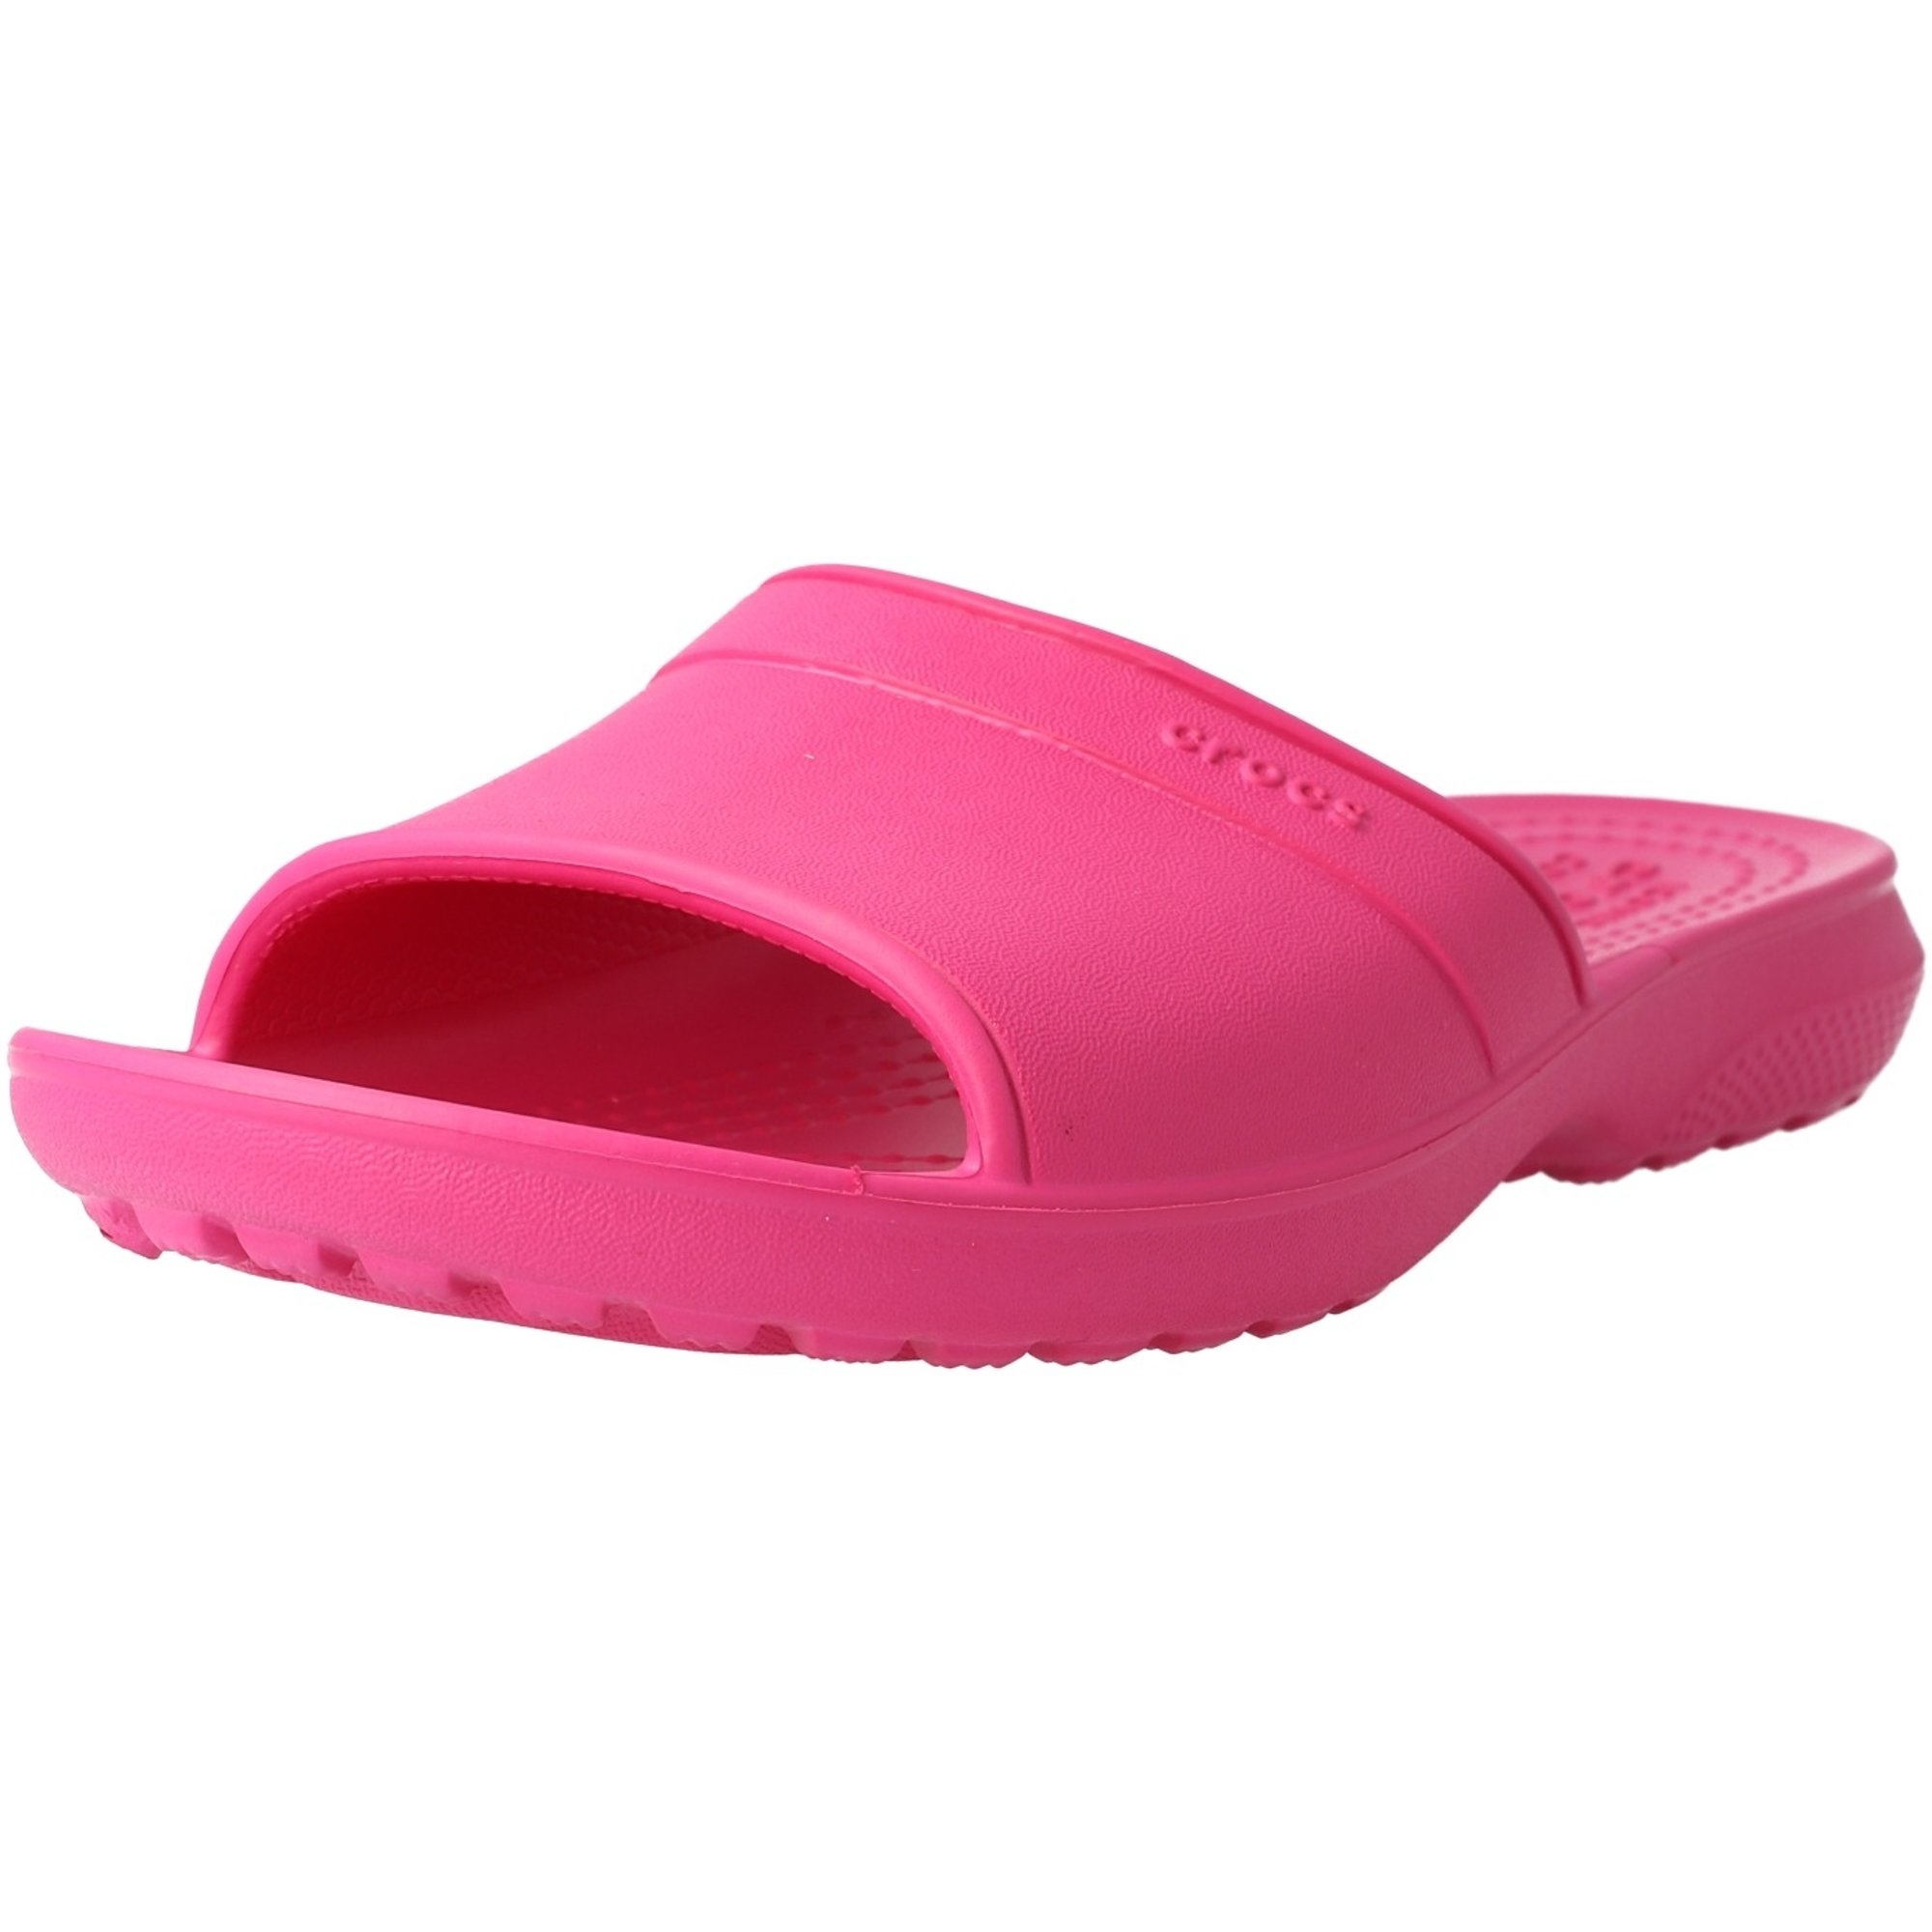 Crocs Kids Classic Slides Candy Pink Croslite